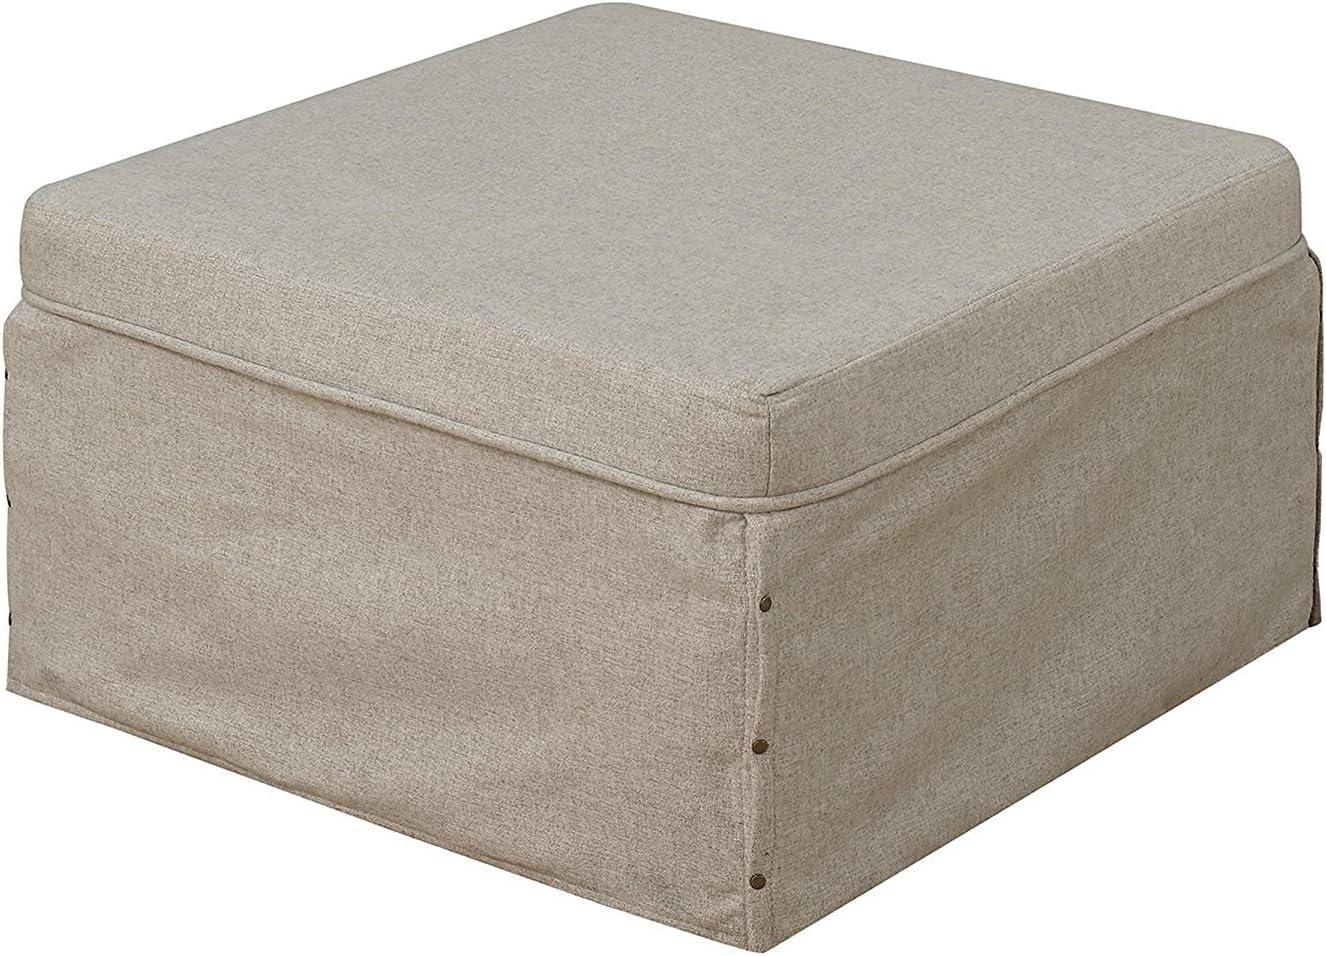 - Amazon.com: Convenience Concepts Designs4Comfort Folding Bed